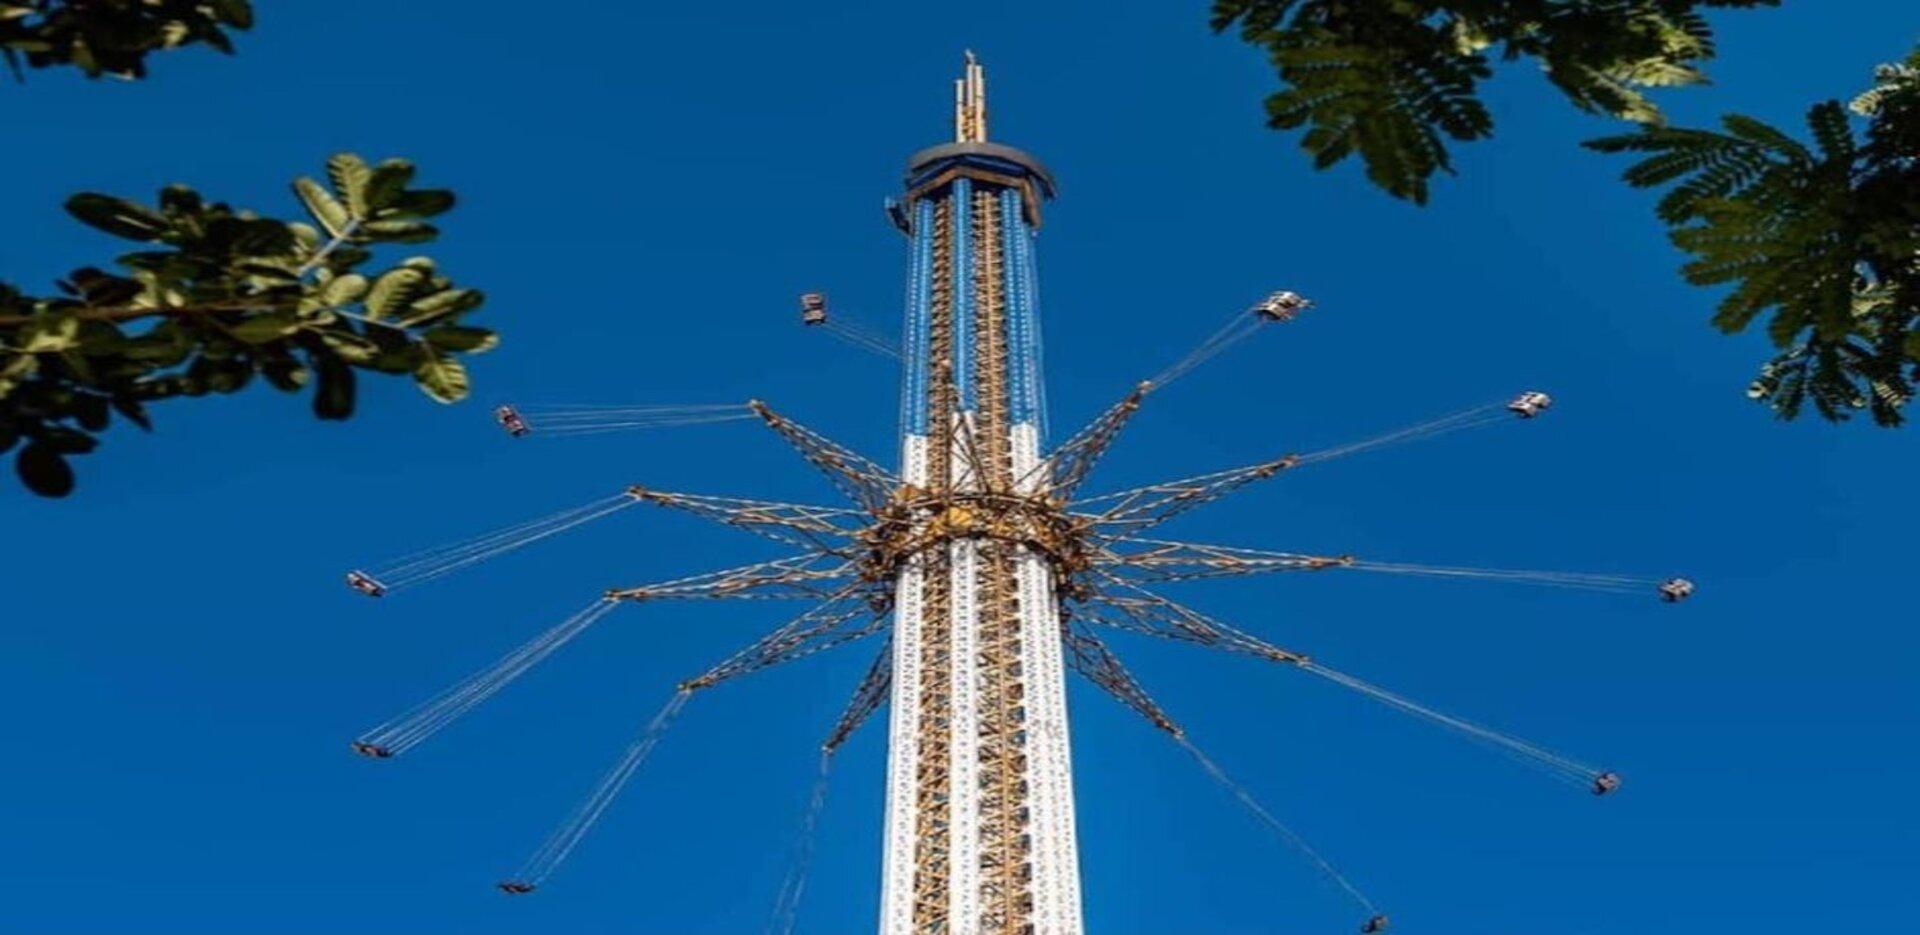 Bollywoord Skyflyer swing in Dubai